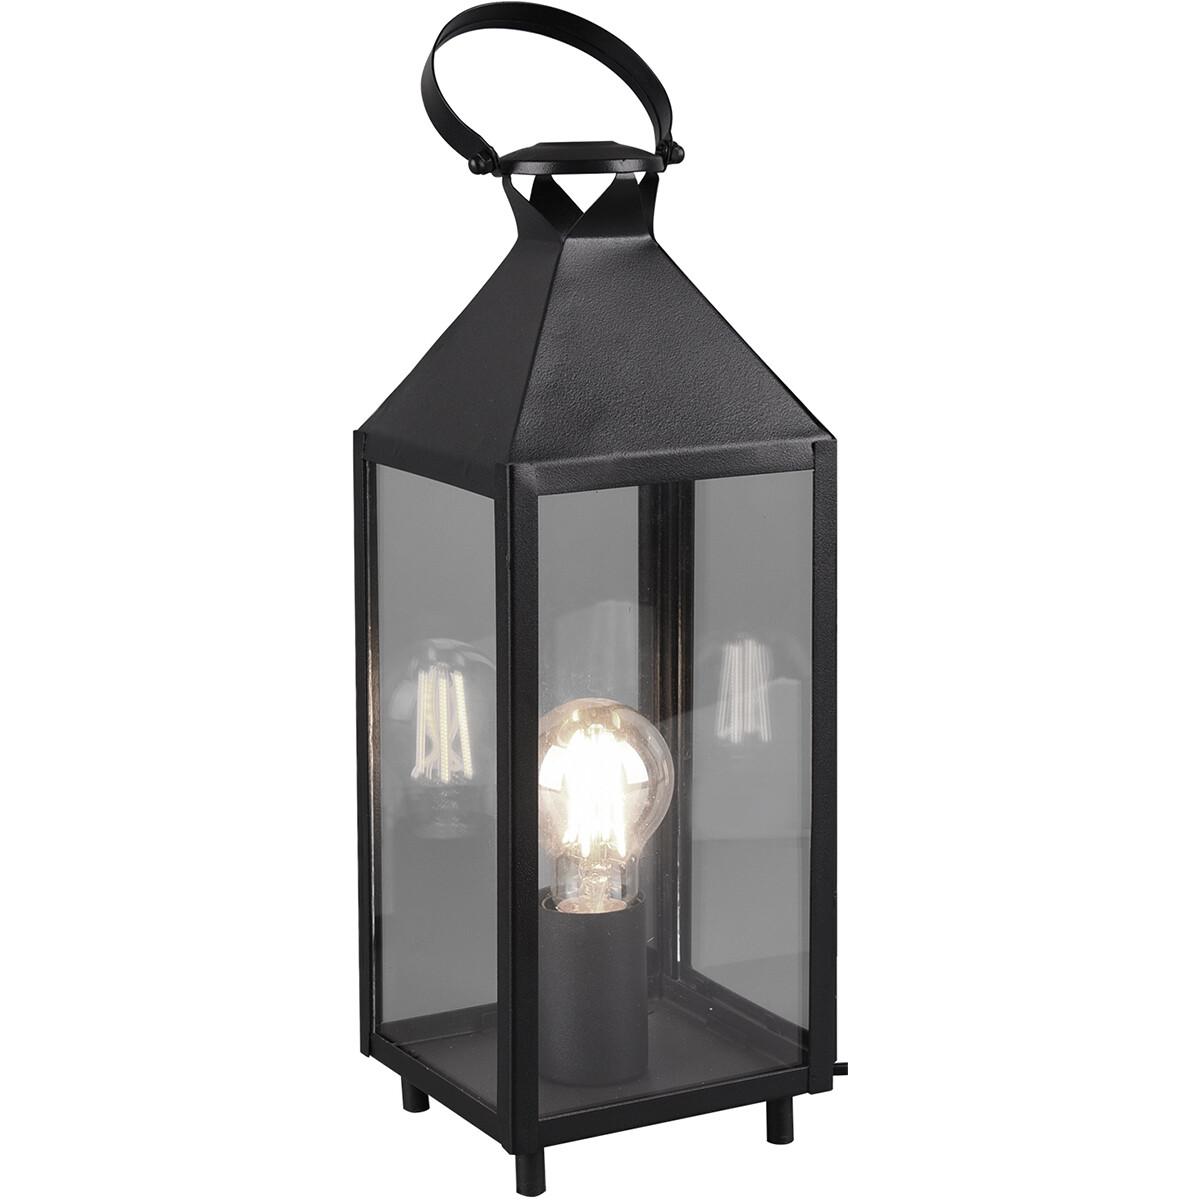 LED Tafellamp - Tafelverlichting - Trion Fala - E27 Fitting - Rechthoek - Mat Zwart - Aluminium